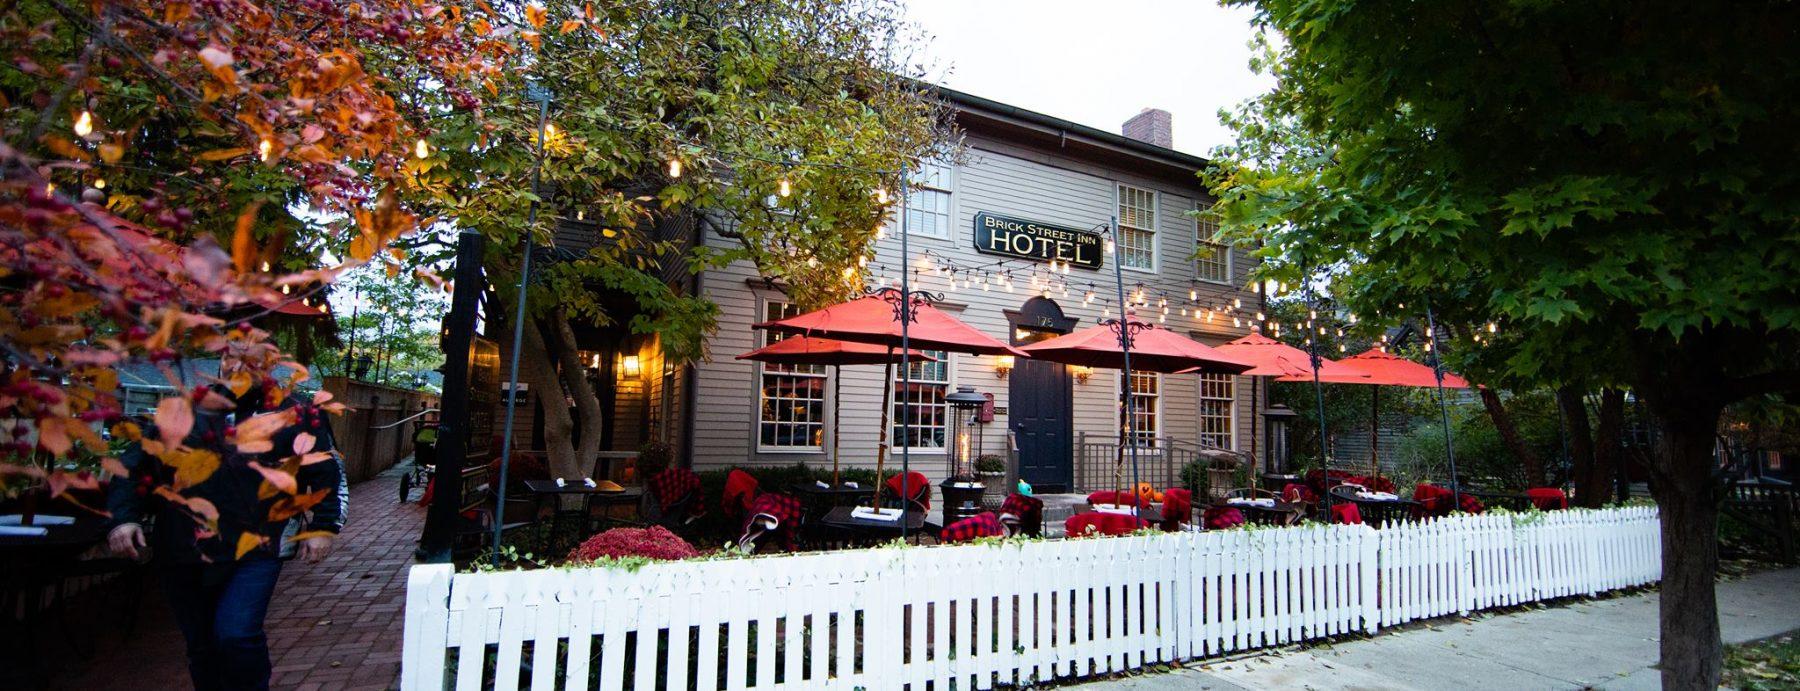 Brick Street Inn Exterior